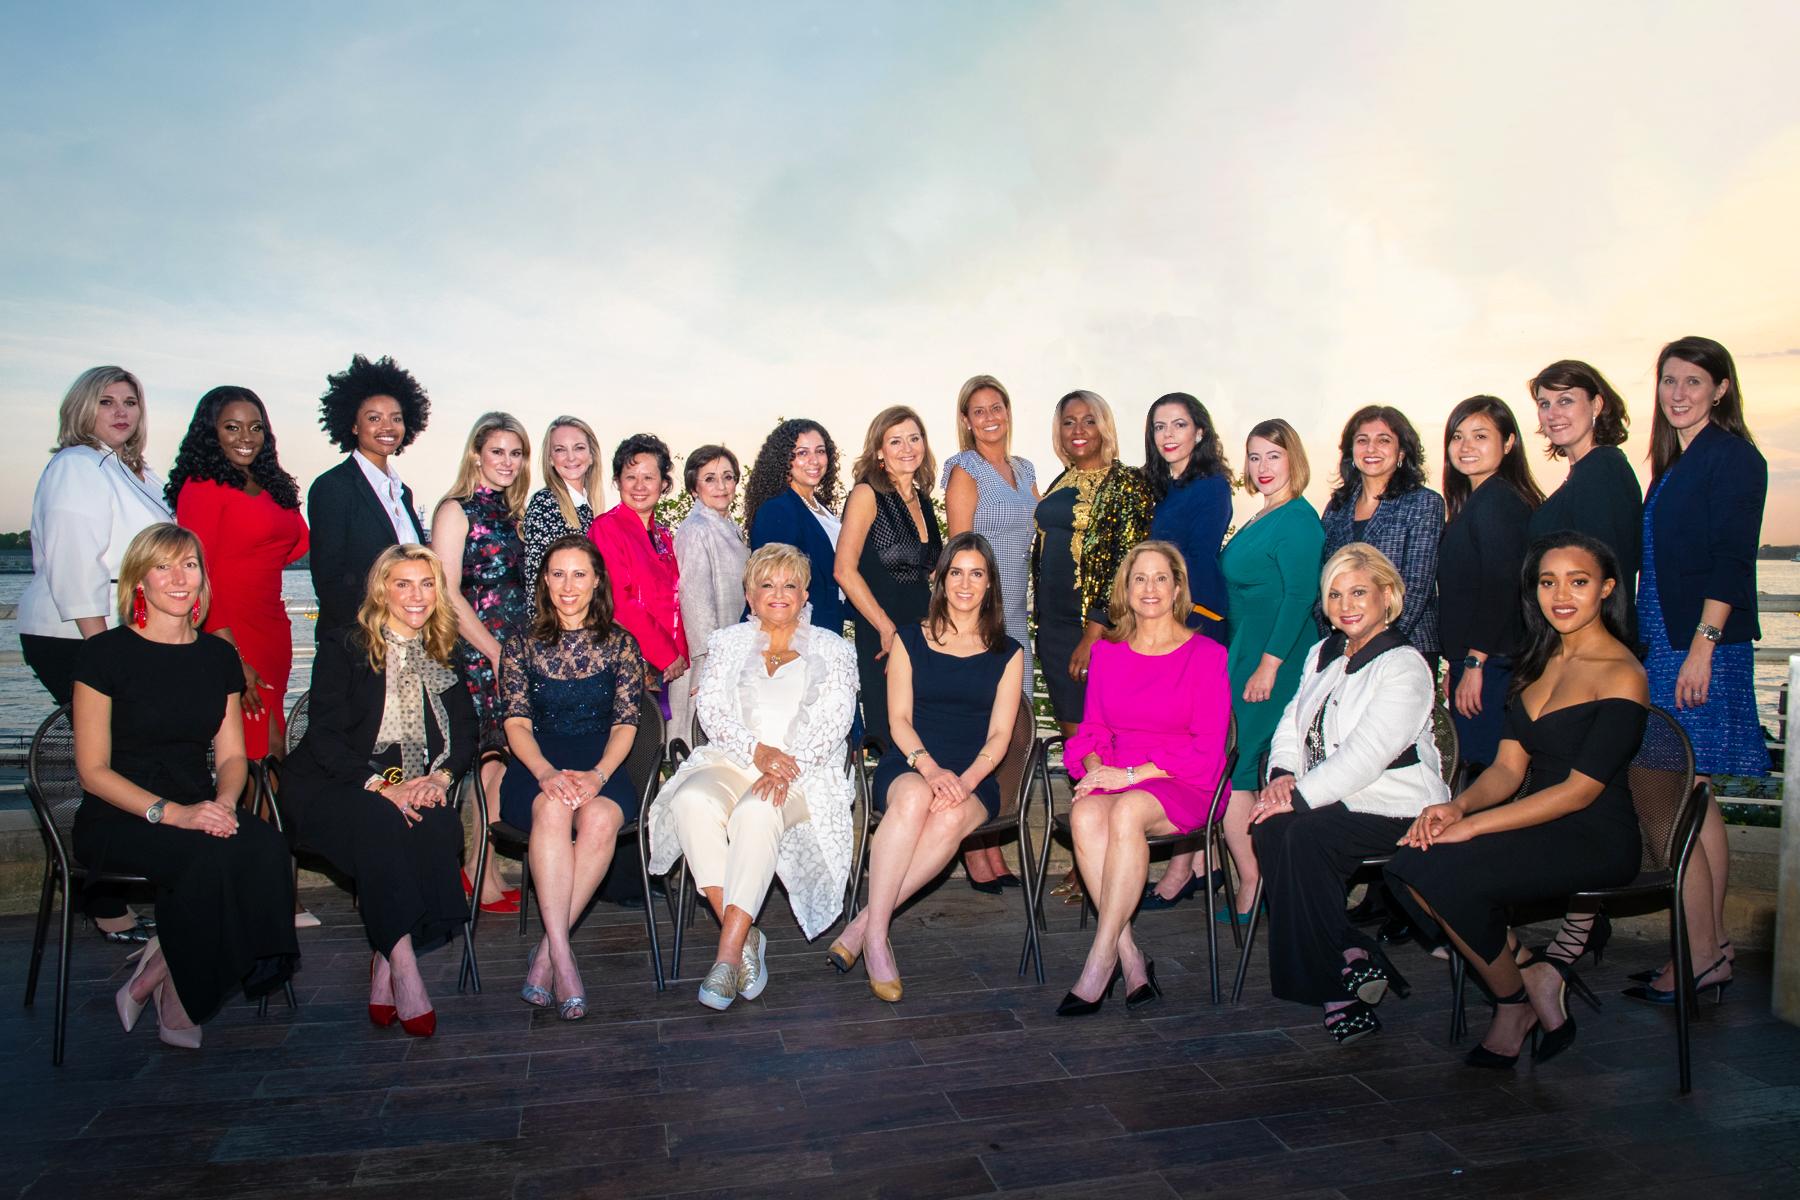 2019_Corazon_Women_of_Wall_StreetDSC_6669_No_Tree.jpg